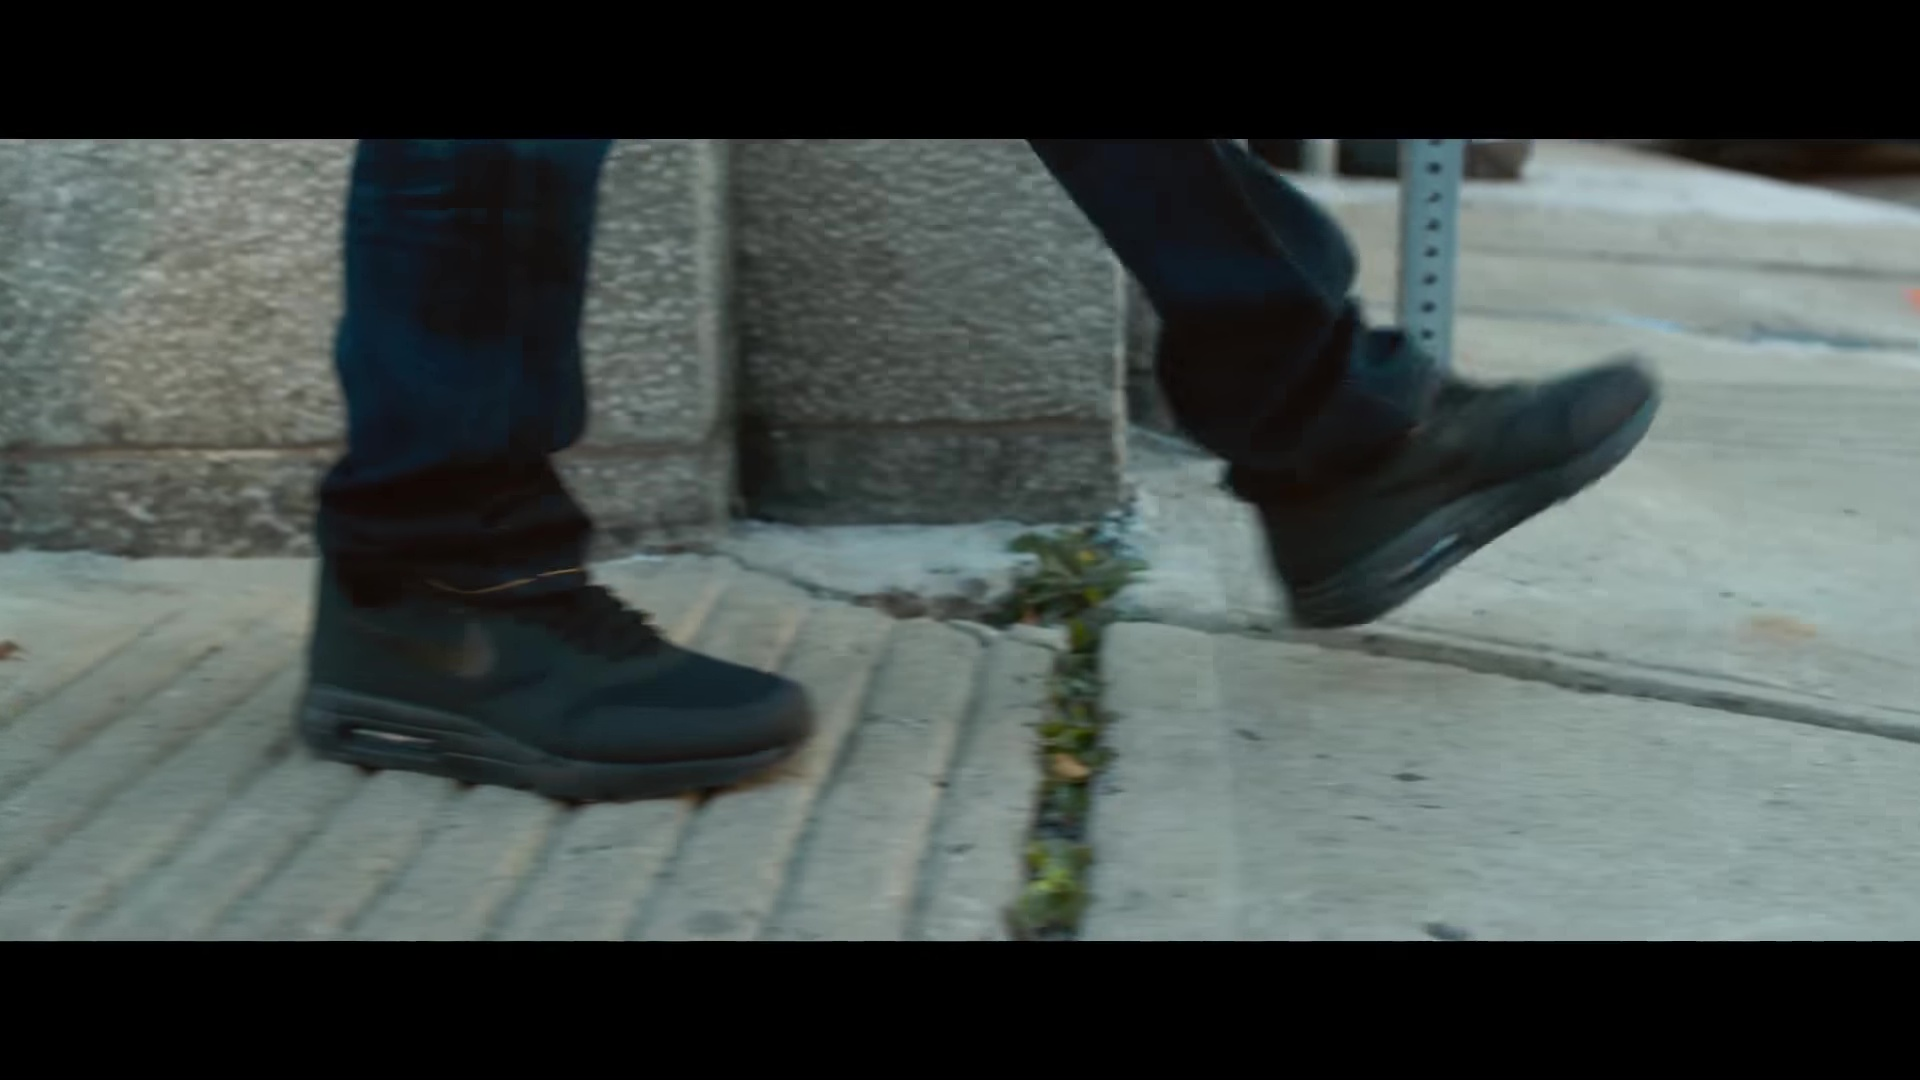 nike sneakers black worn by bruce willis in death wish